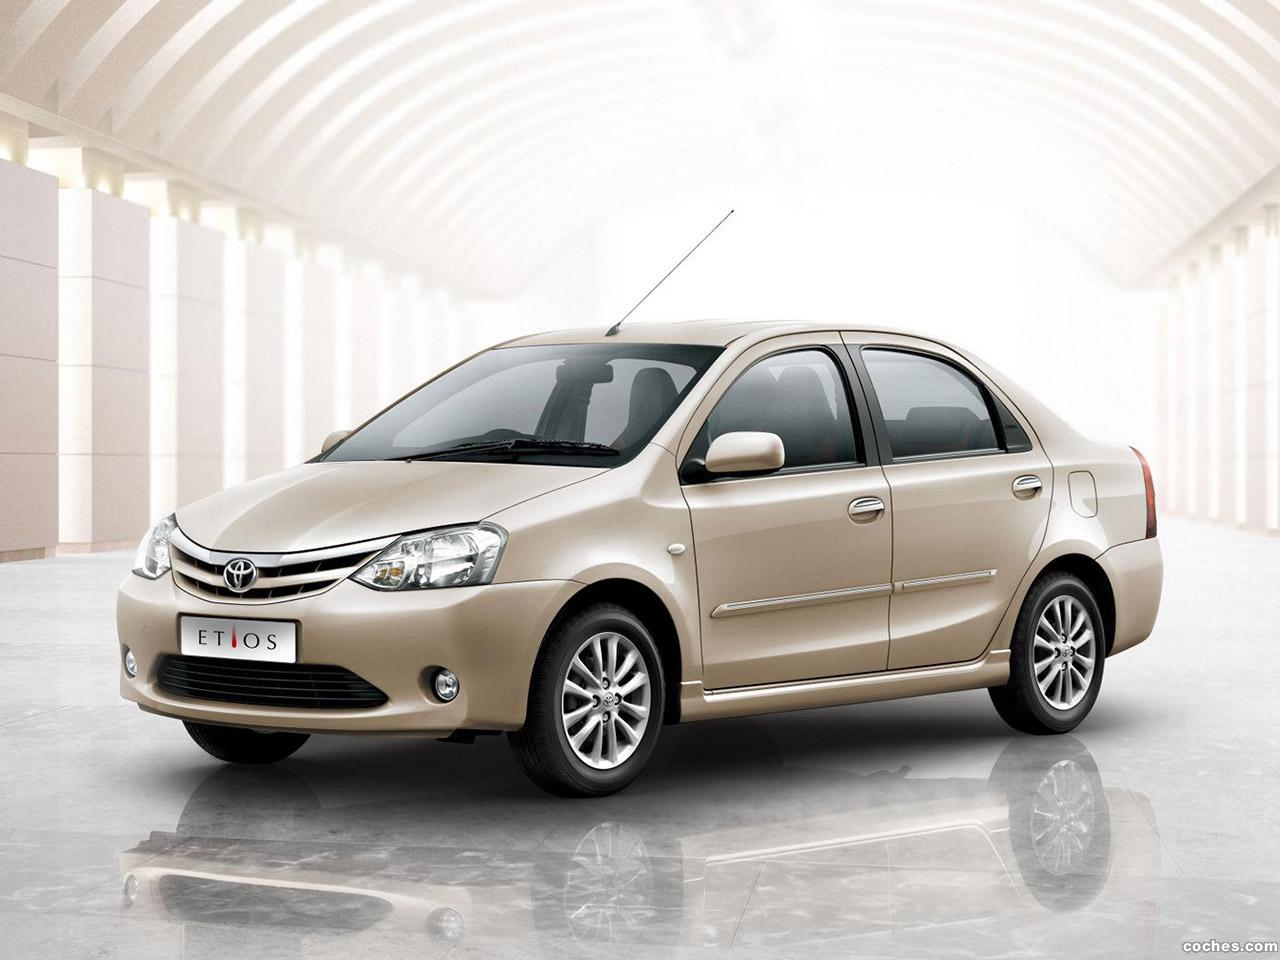 Foto 0 de Toyota Etios Sedan 2011